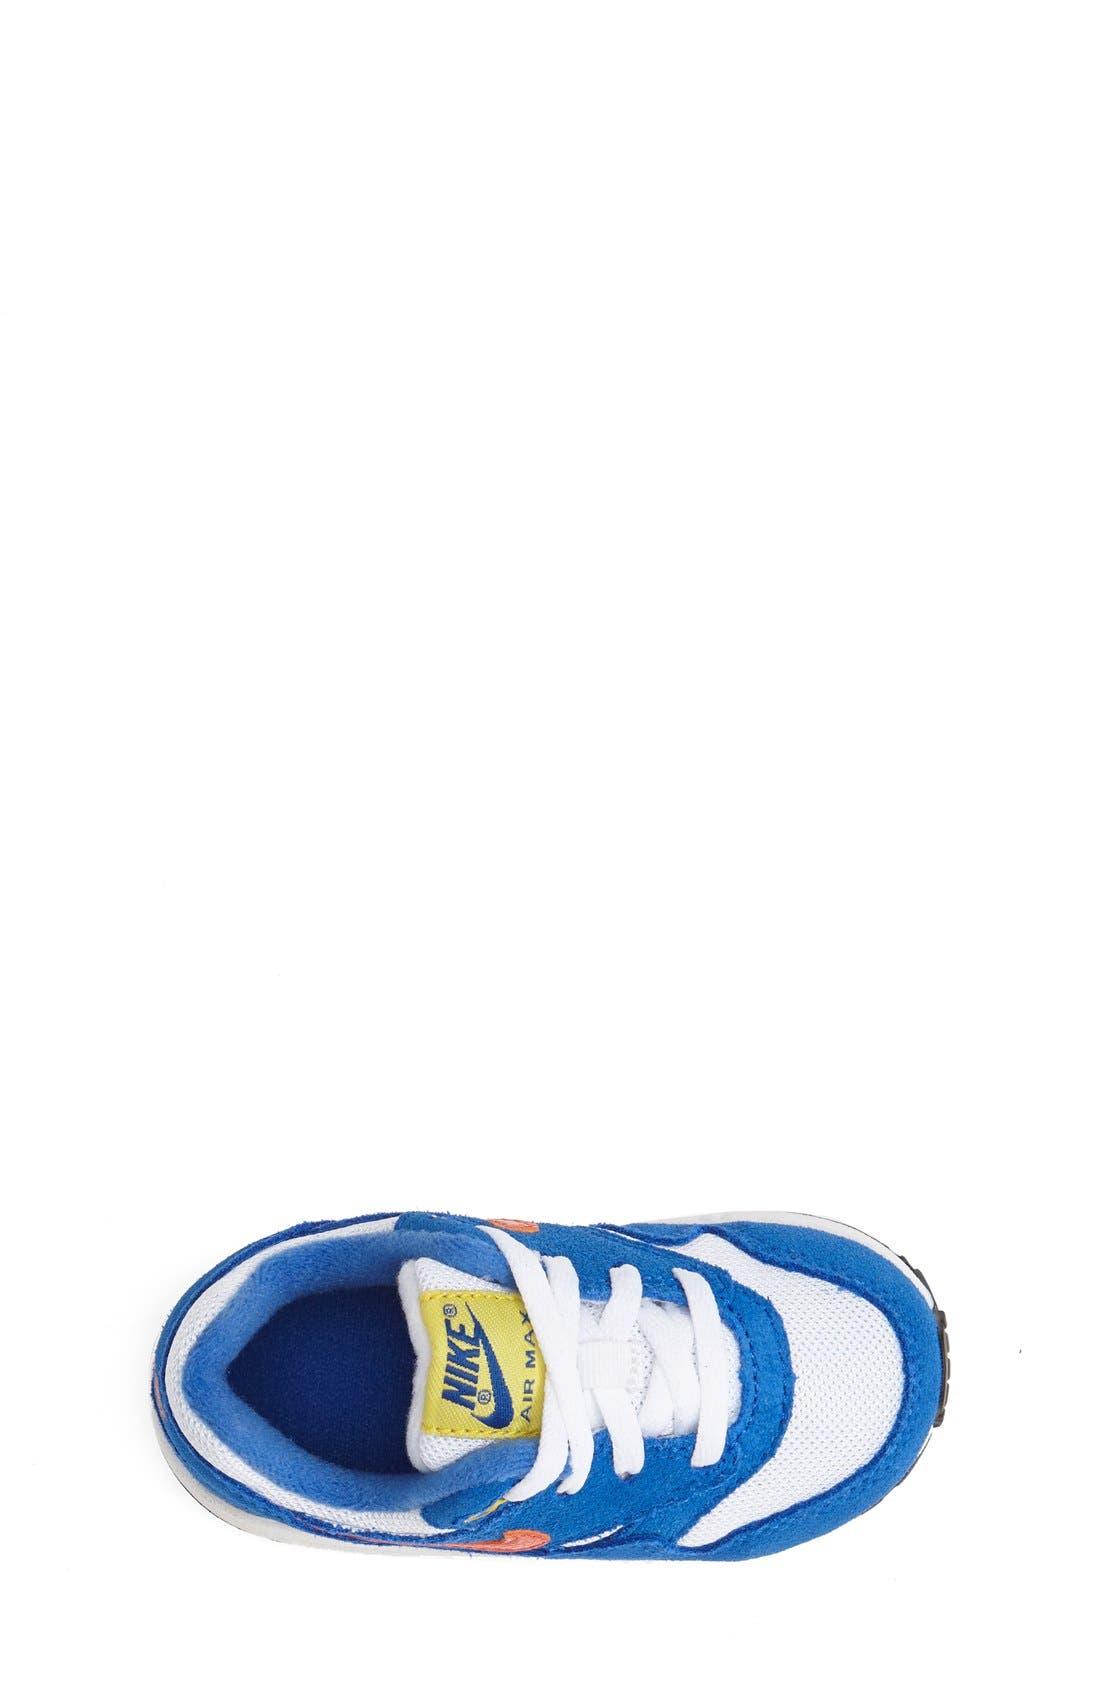 Alternate Image 3  - Nike 'Air Max 1 TD' Sneaker (Baby, Walker & Toddler)